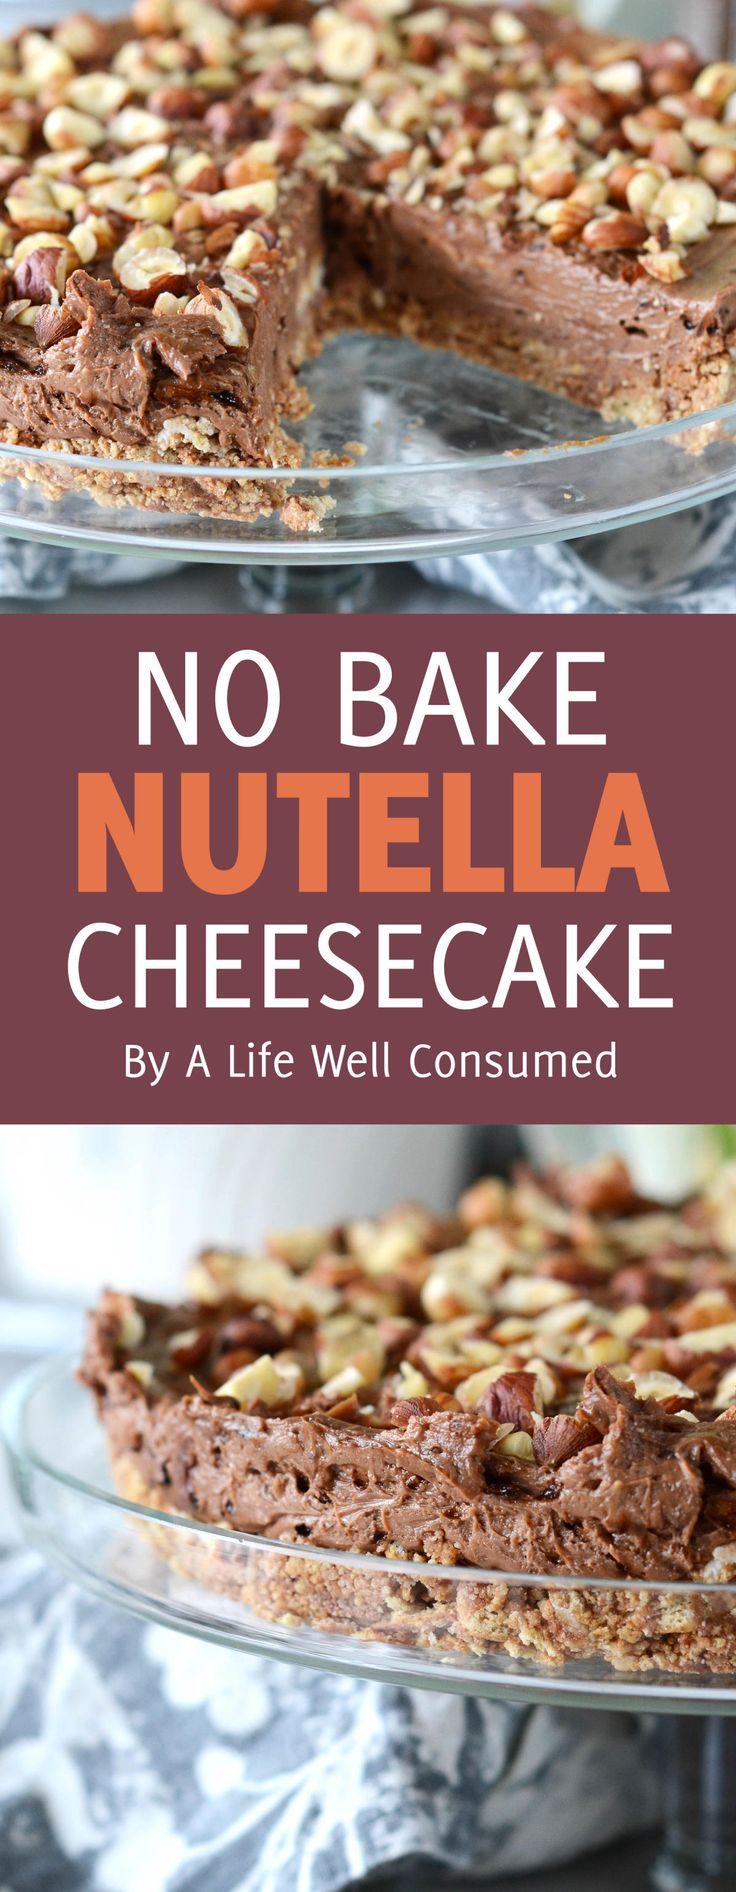 An easy No-bake Nutella Espresso Cheesecake recipe to make for World Nutella Day! Delicious, decadent, creamy, chocolatey cheesecake that showcases Nutella.